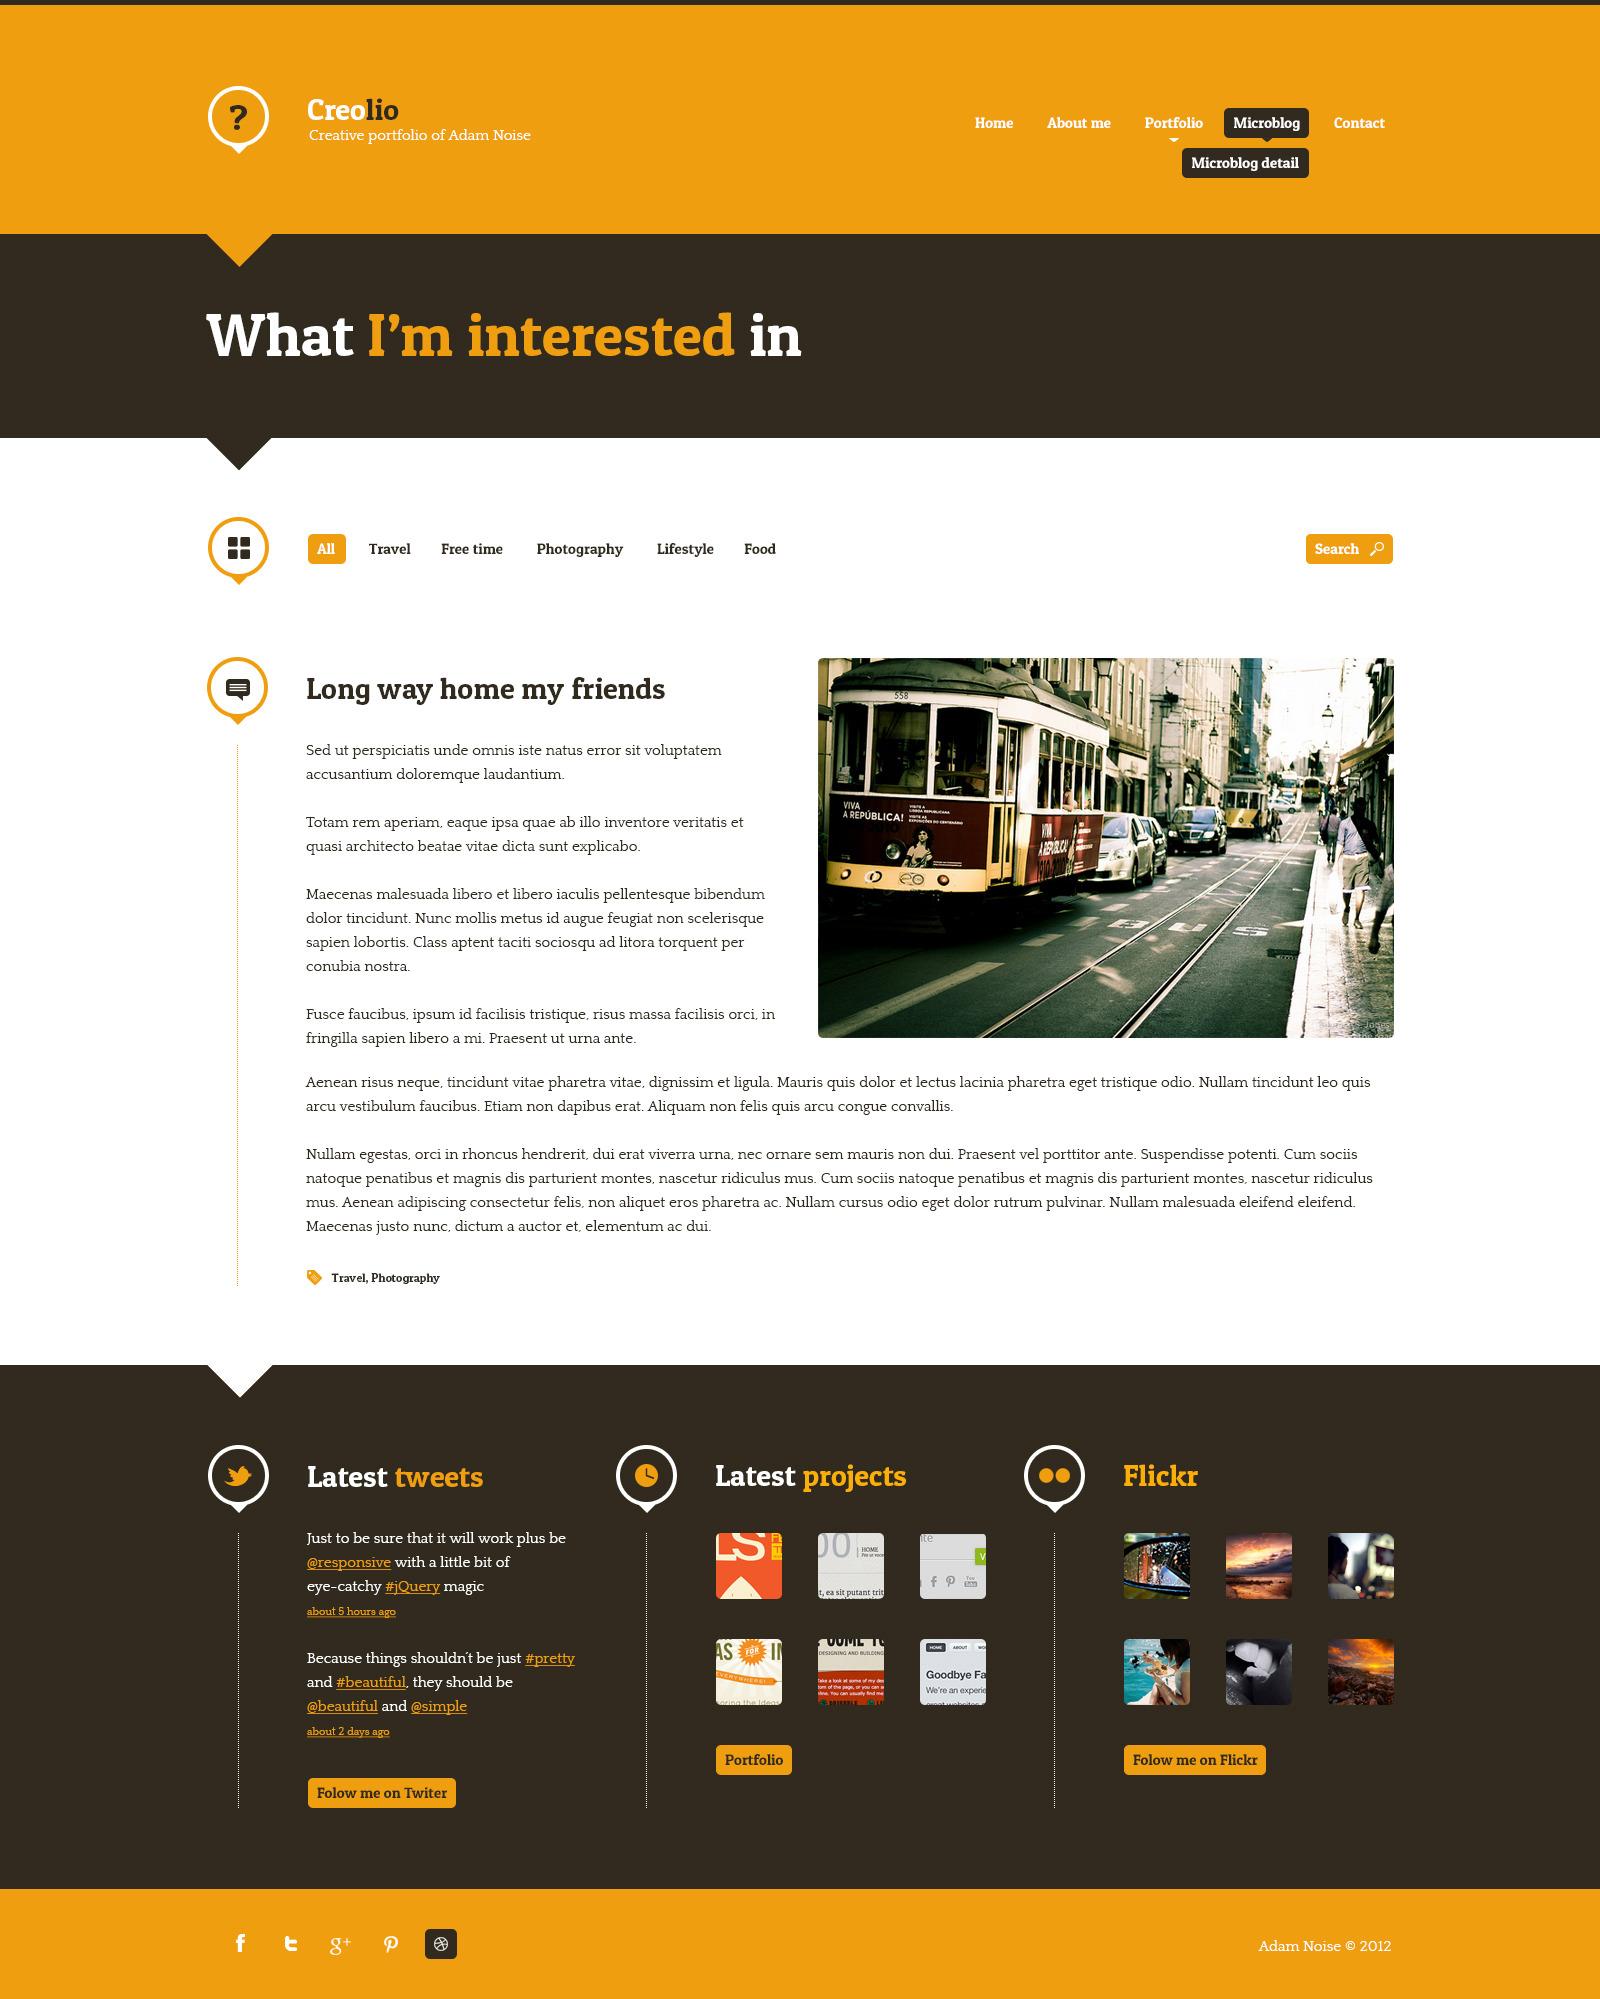 Creolio WP - Personal portfolio and microblog